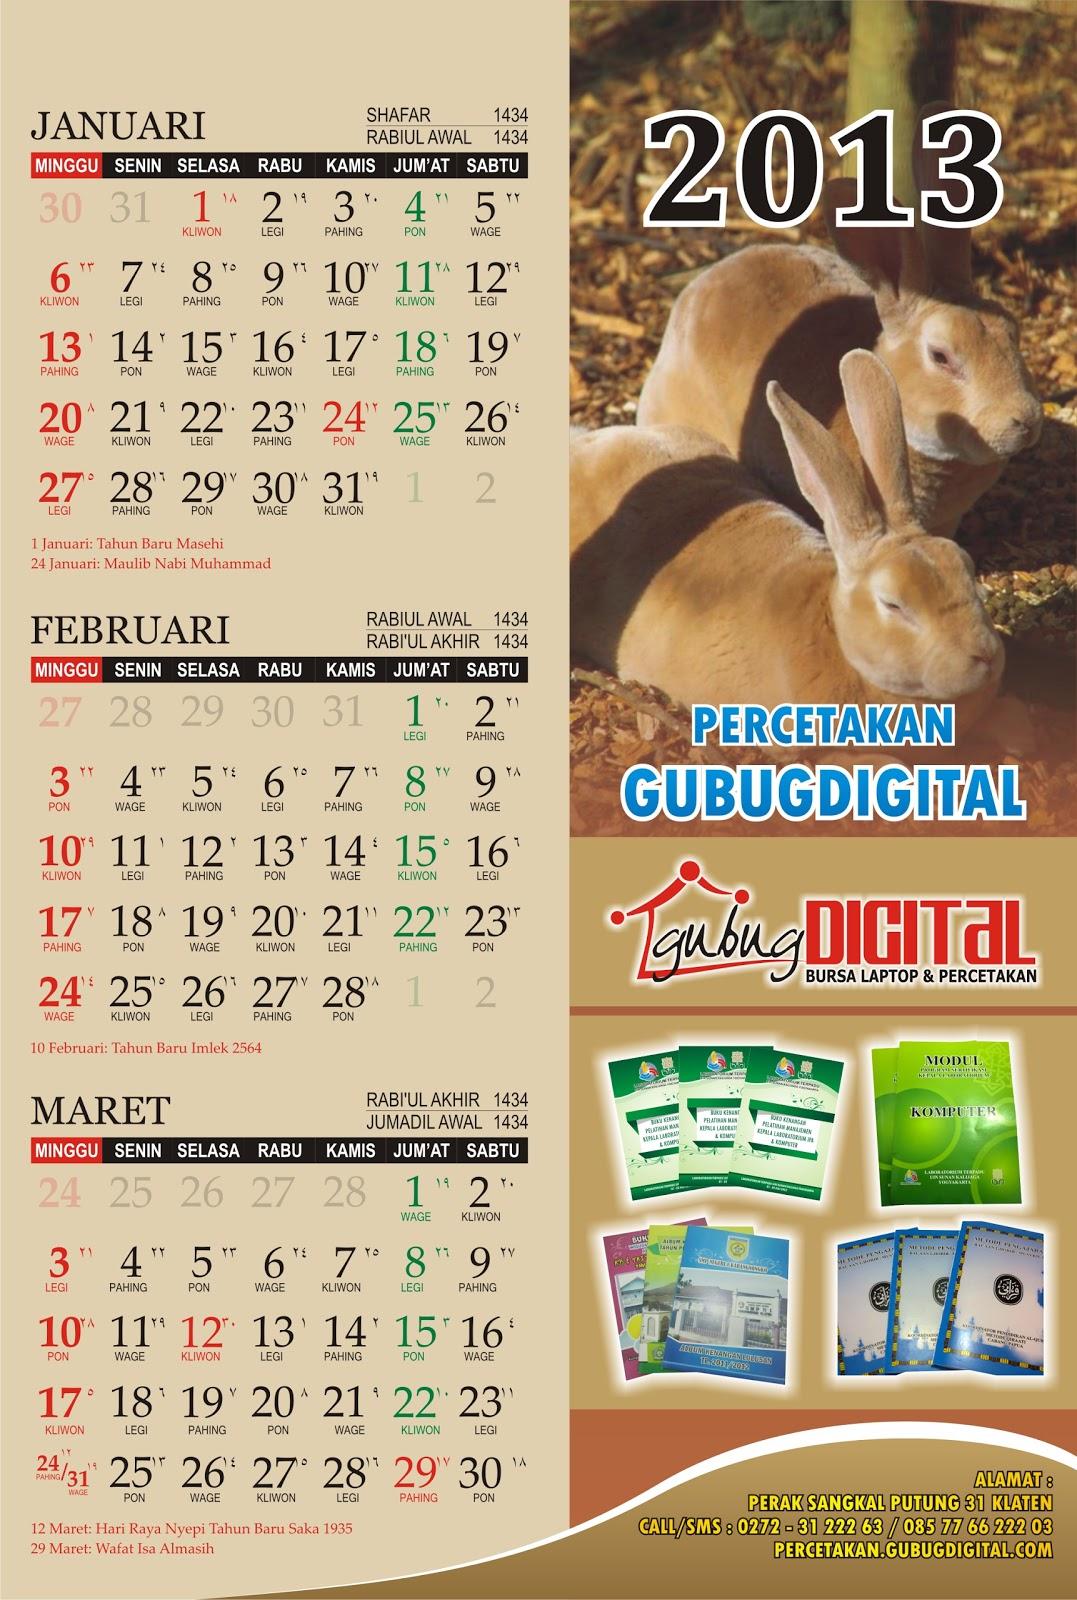 free download kalender islam 2013